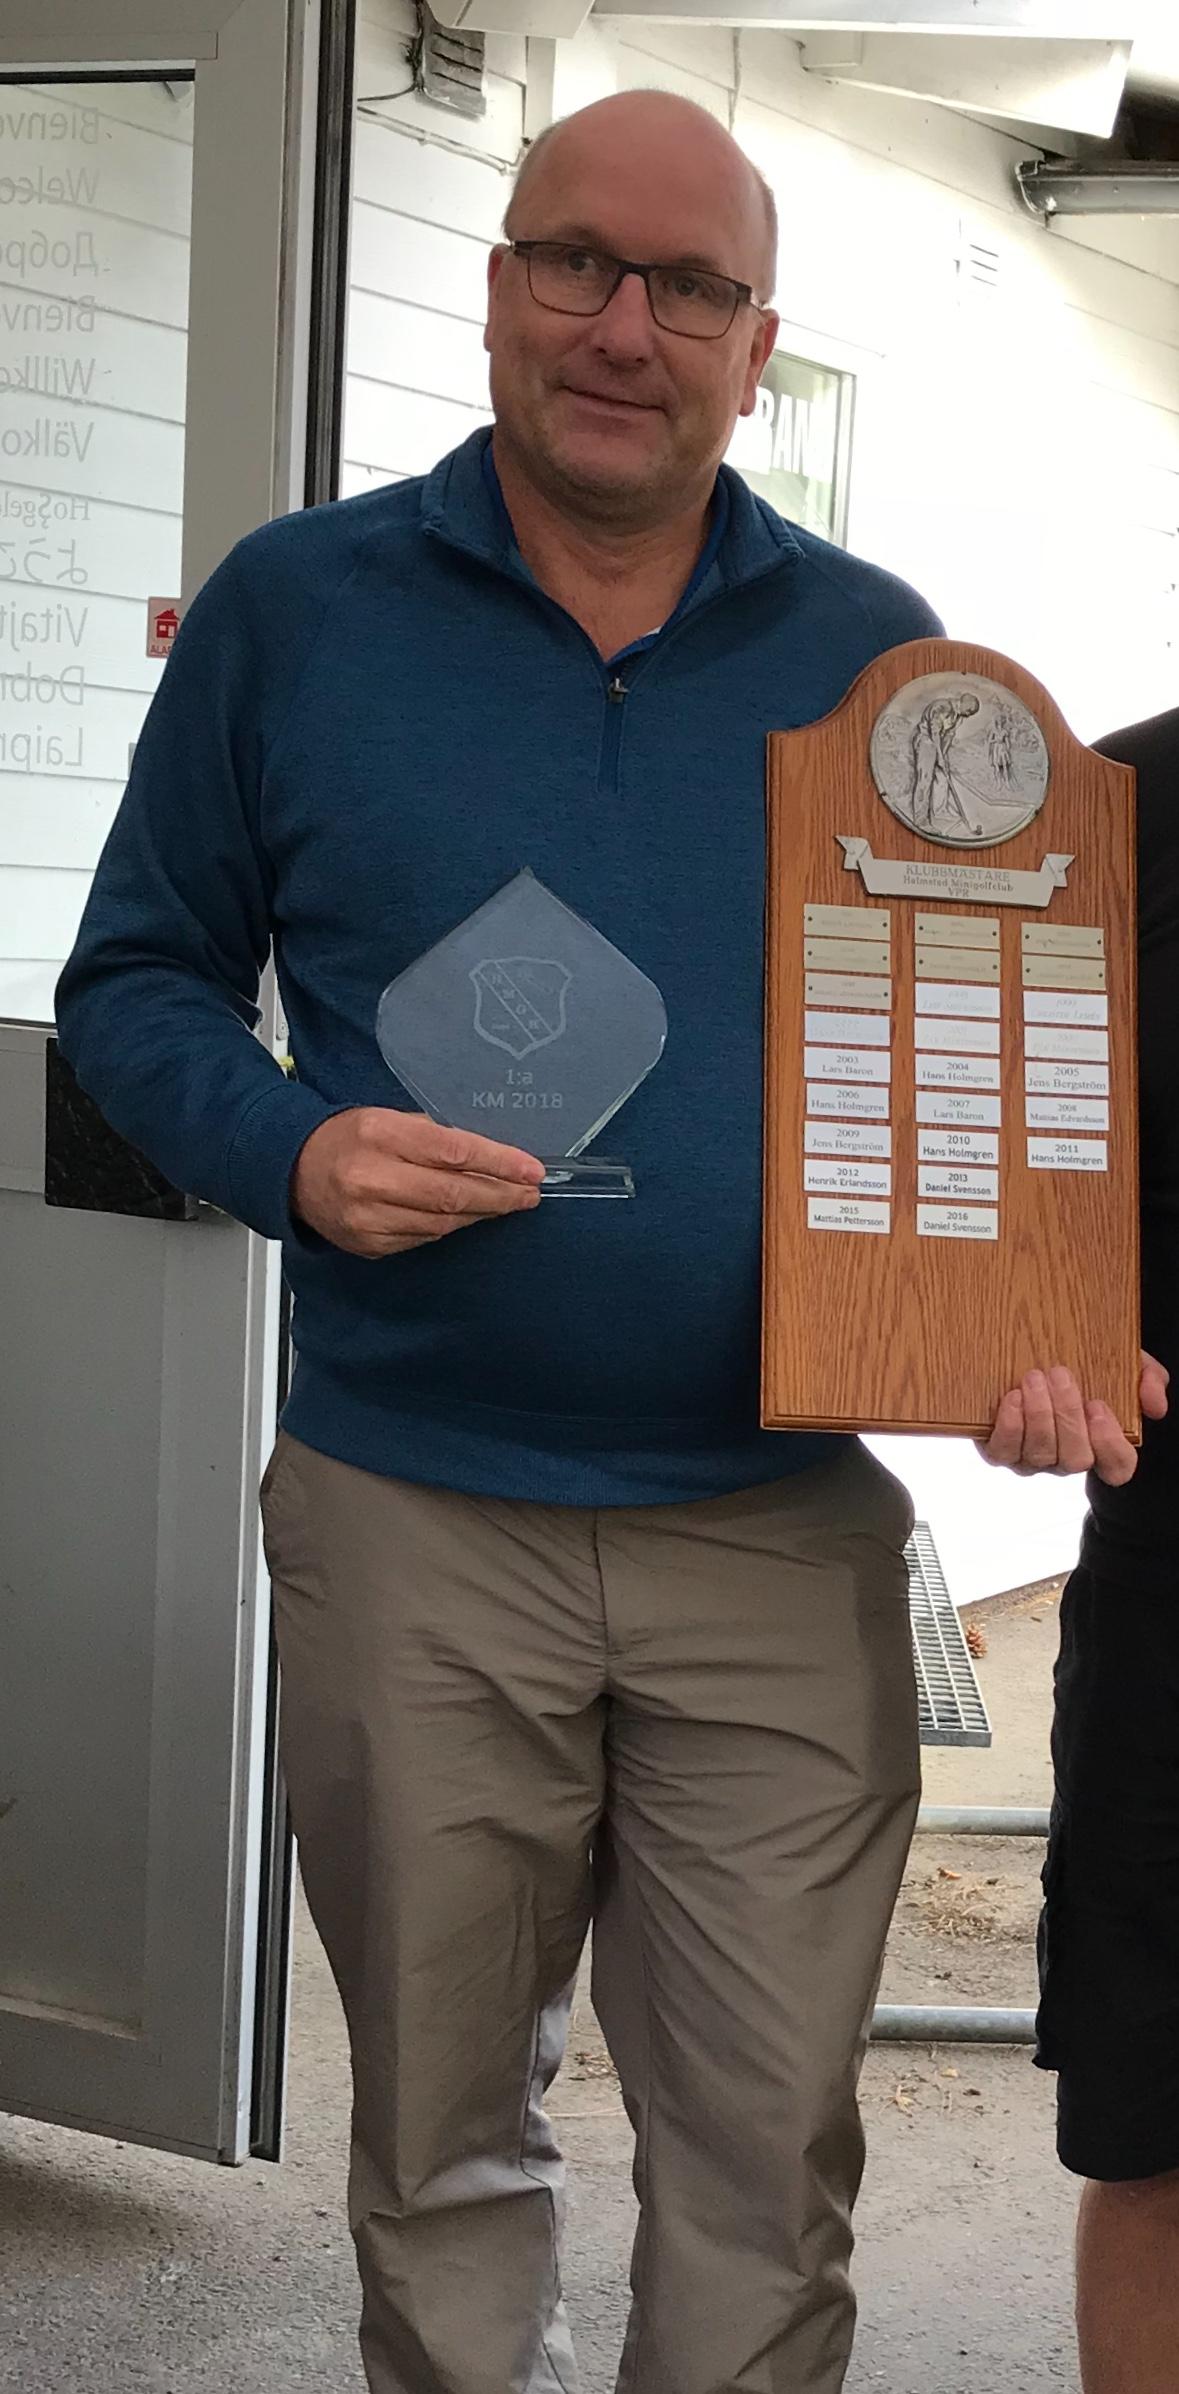 Magnus klubbmästare 2018